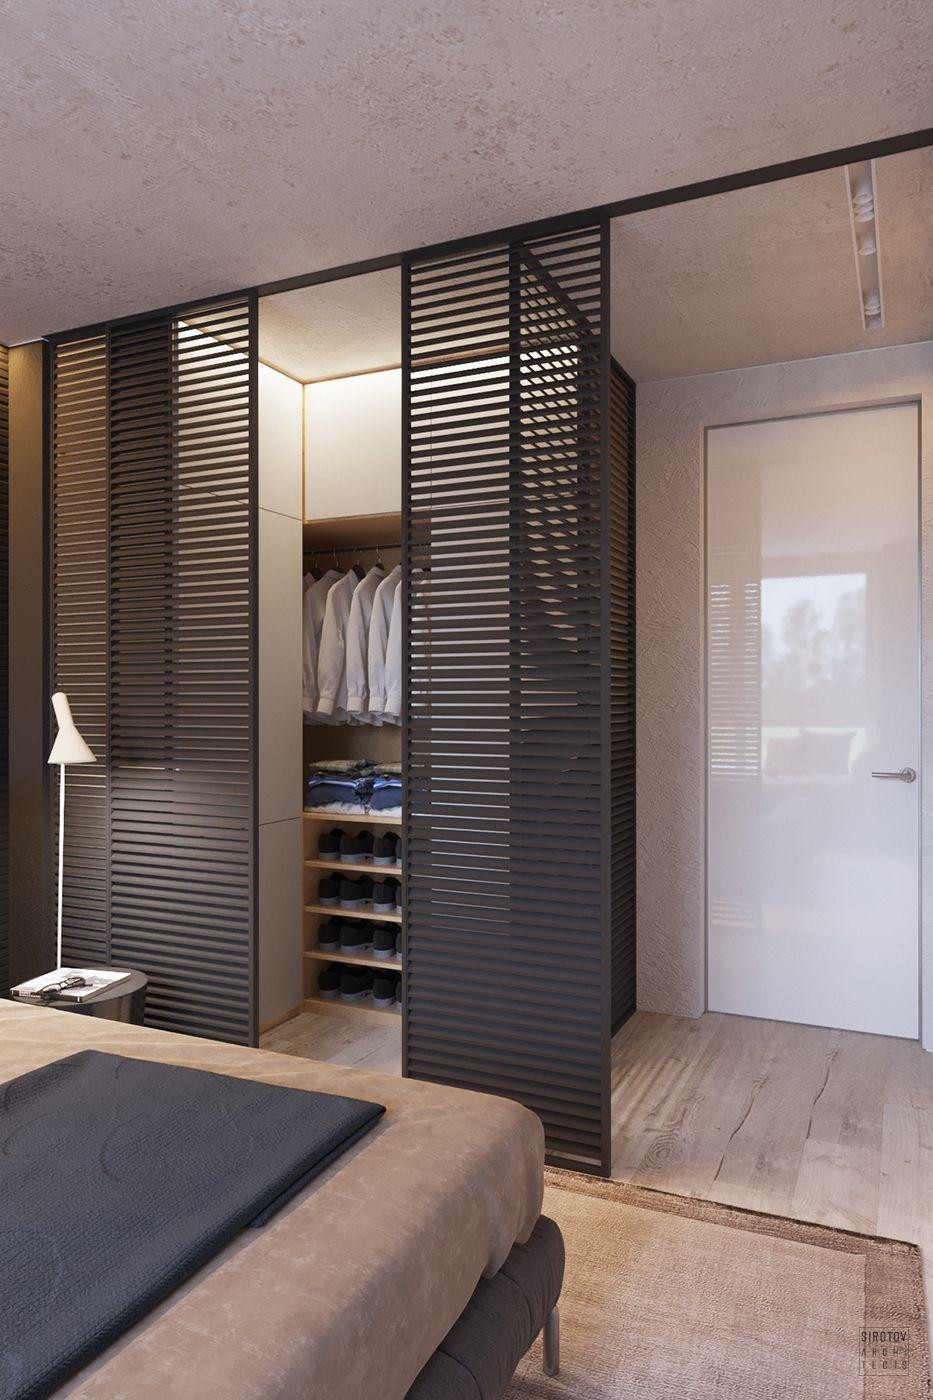 Bedroom alcove hammock in wardrobe interior architecture design also portas  divisorias separation room house rh pinterest